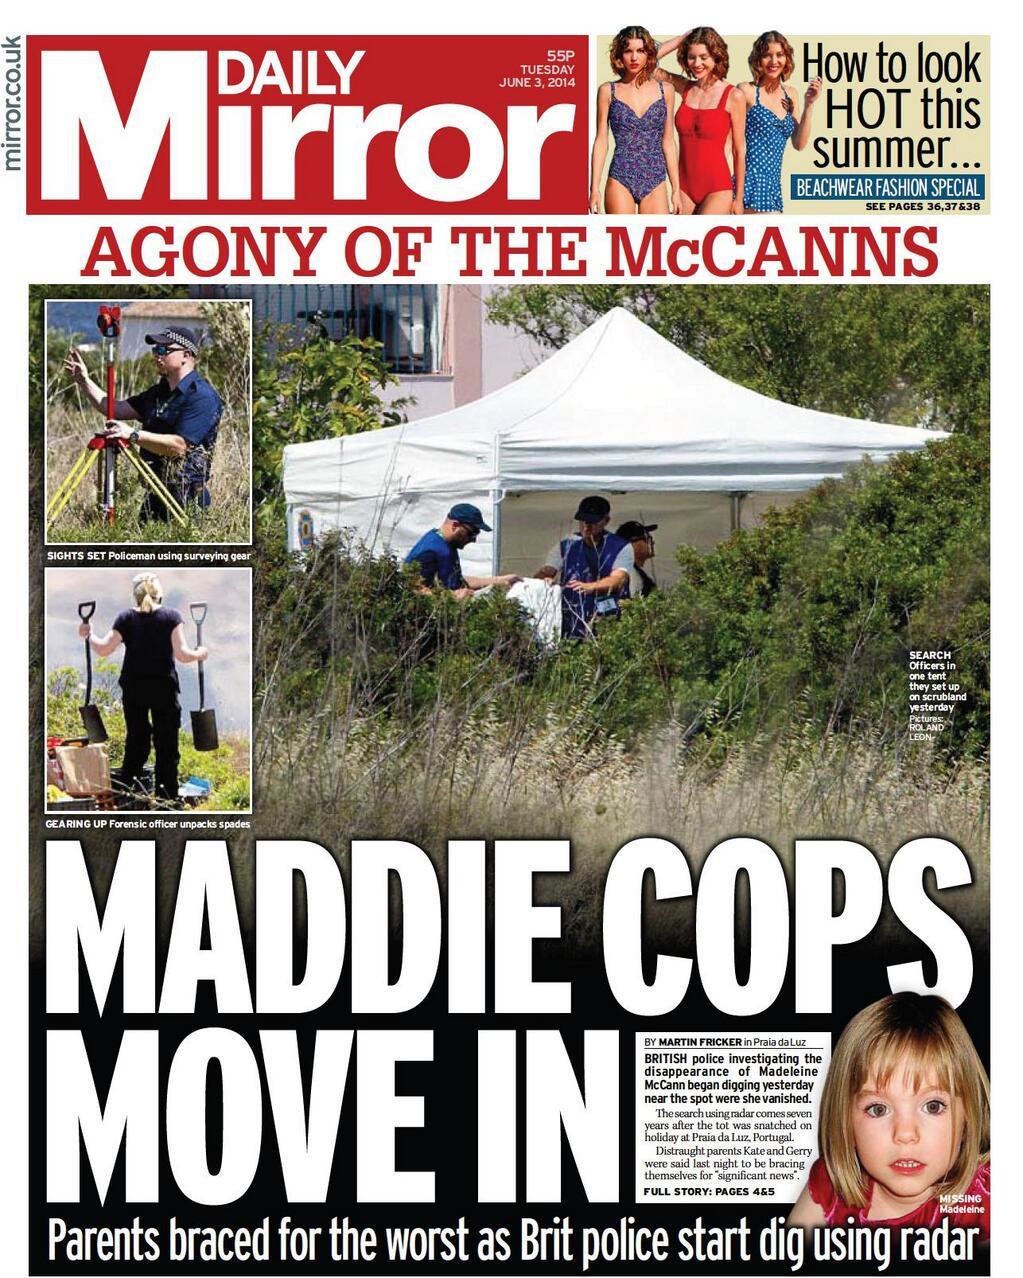 US REPORT: Madeleine McCann mystery solved DailyMirror030614